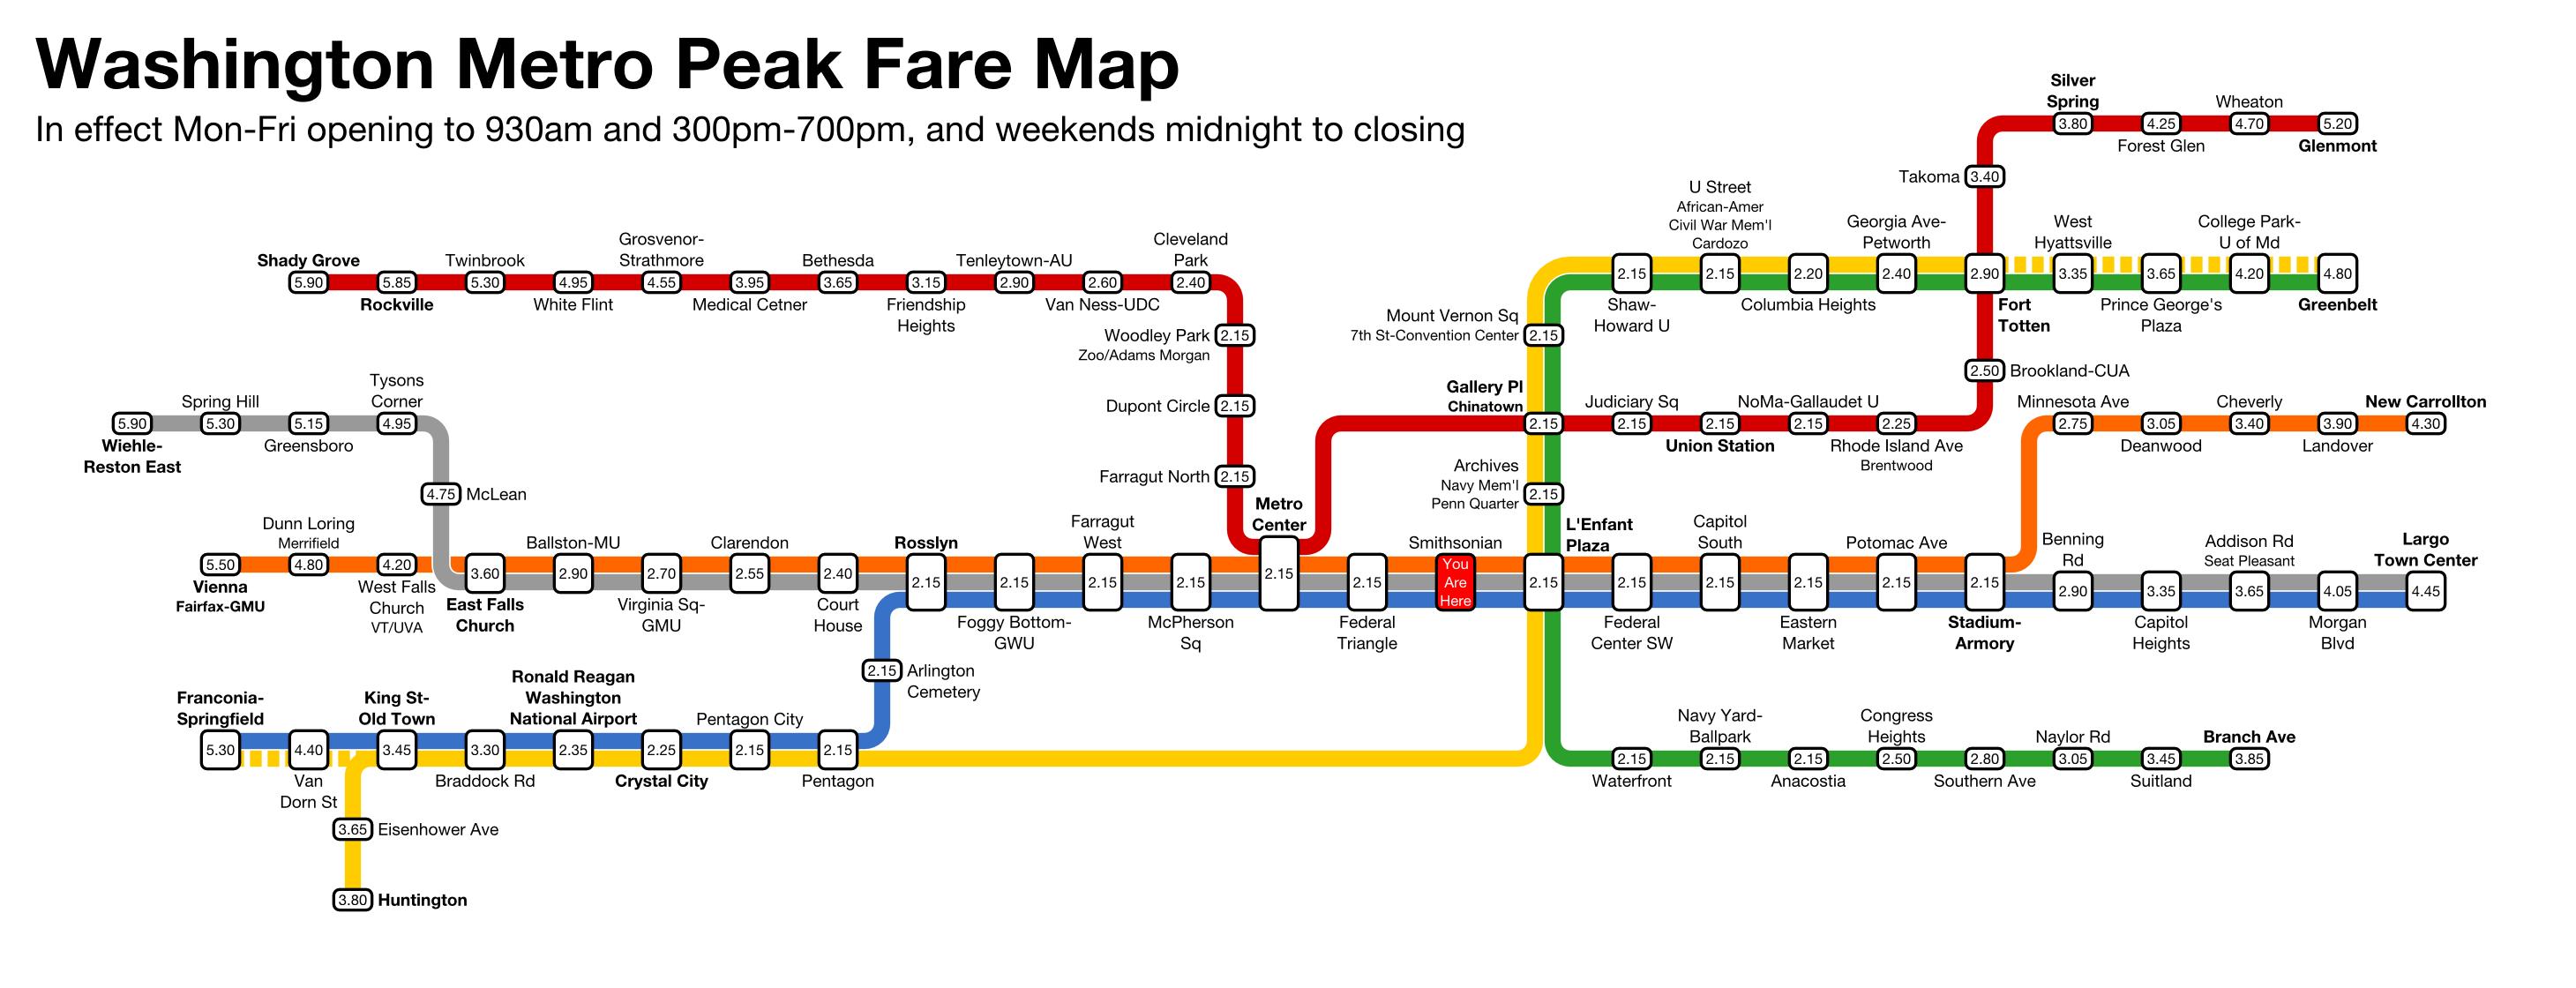 Washington Metro Subway Map.Washington Metro Fare Map Theodore Ditsek